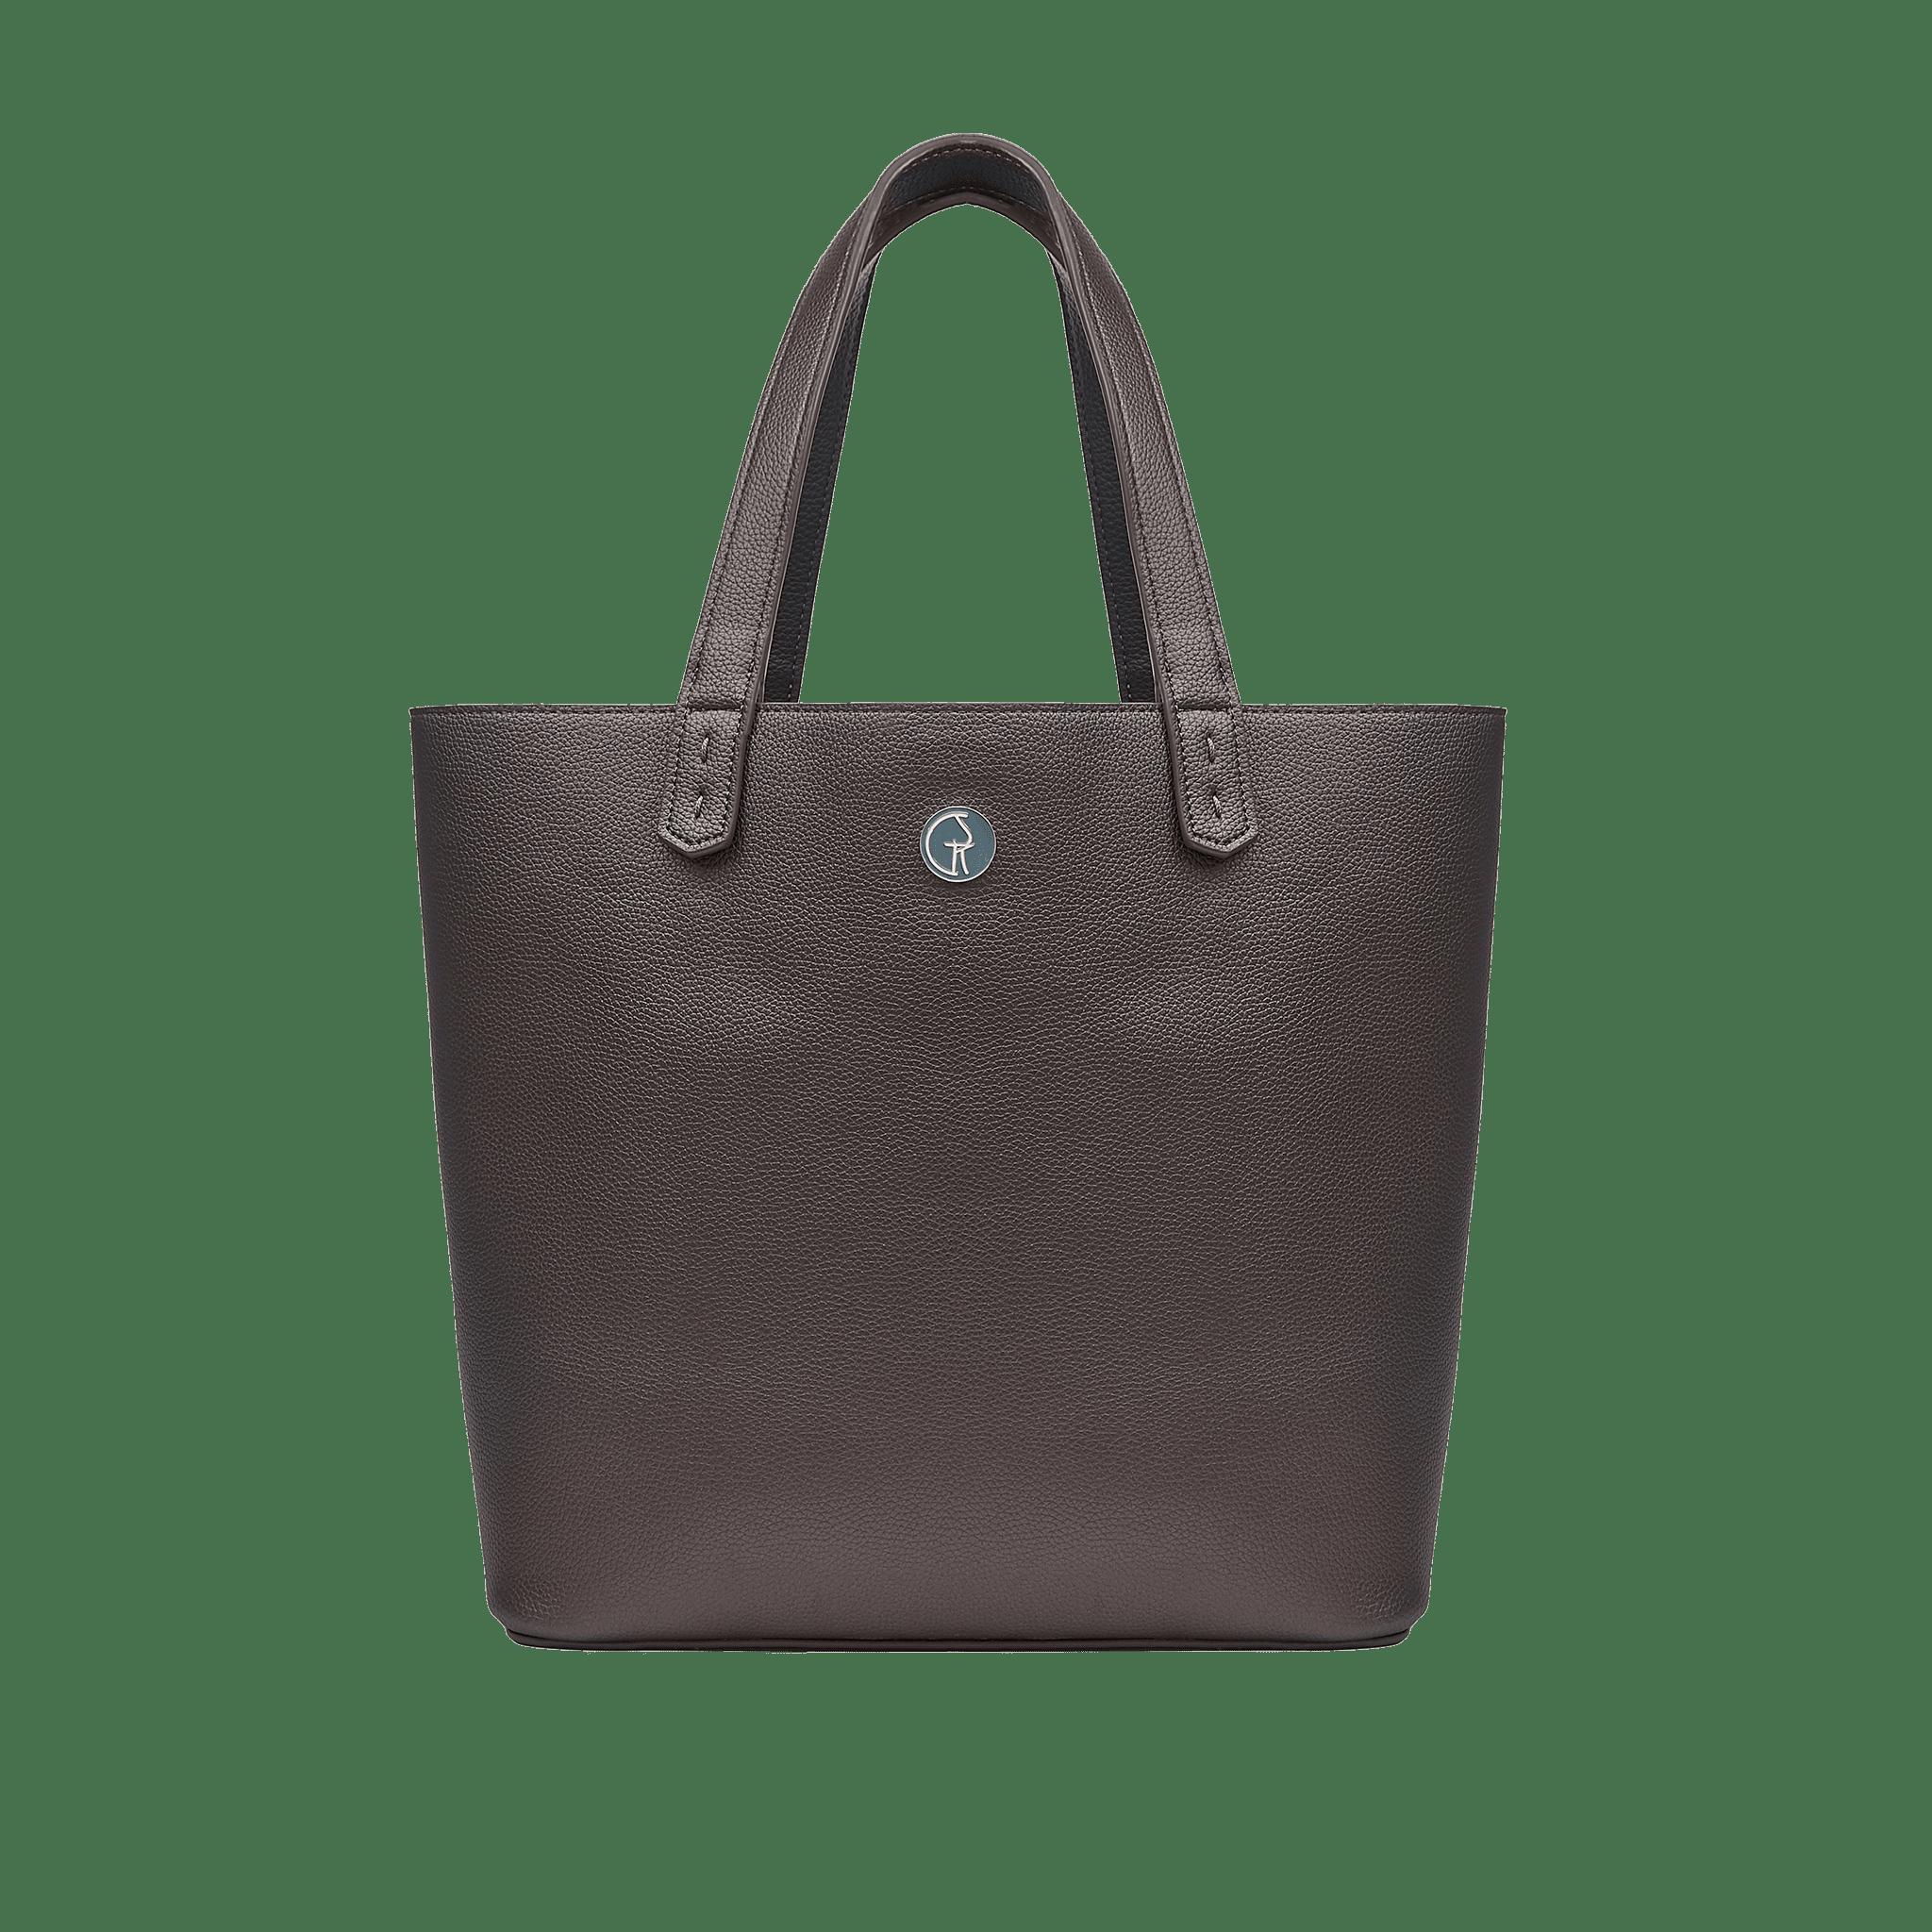 The Morphbag by GSK 3 Vegan Leather Bags in 1 | Black Forest Green & Metallic Mushroom